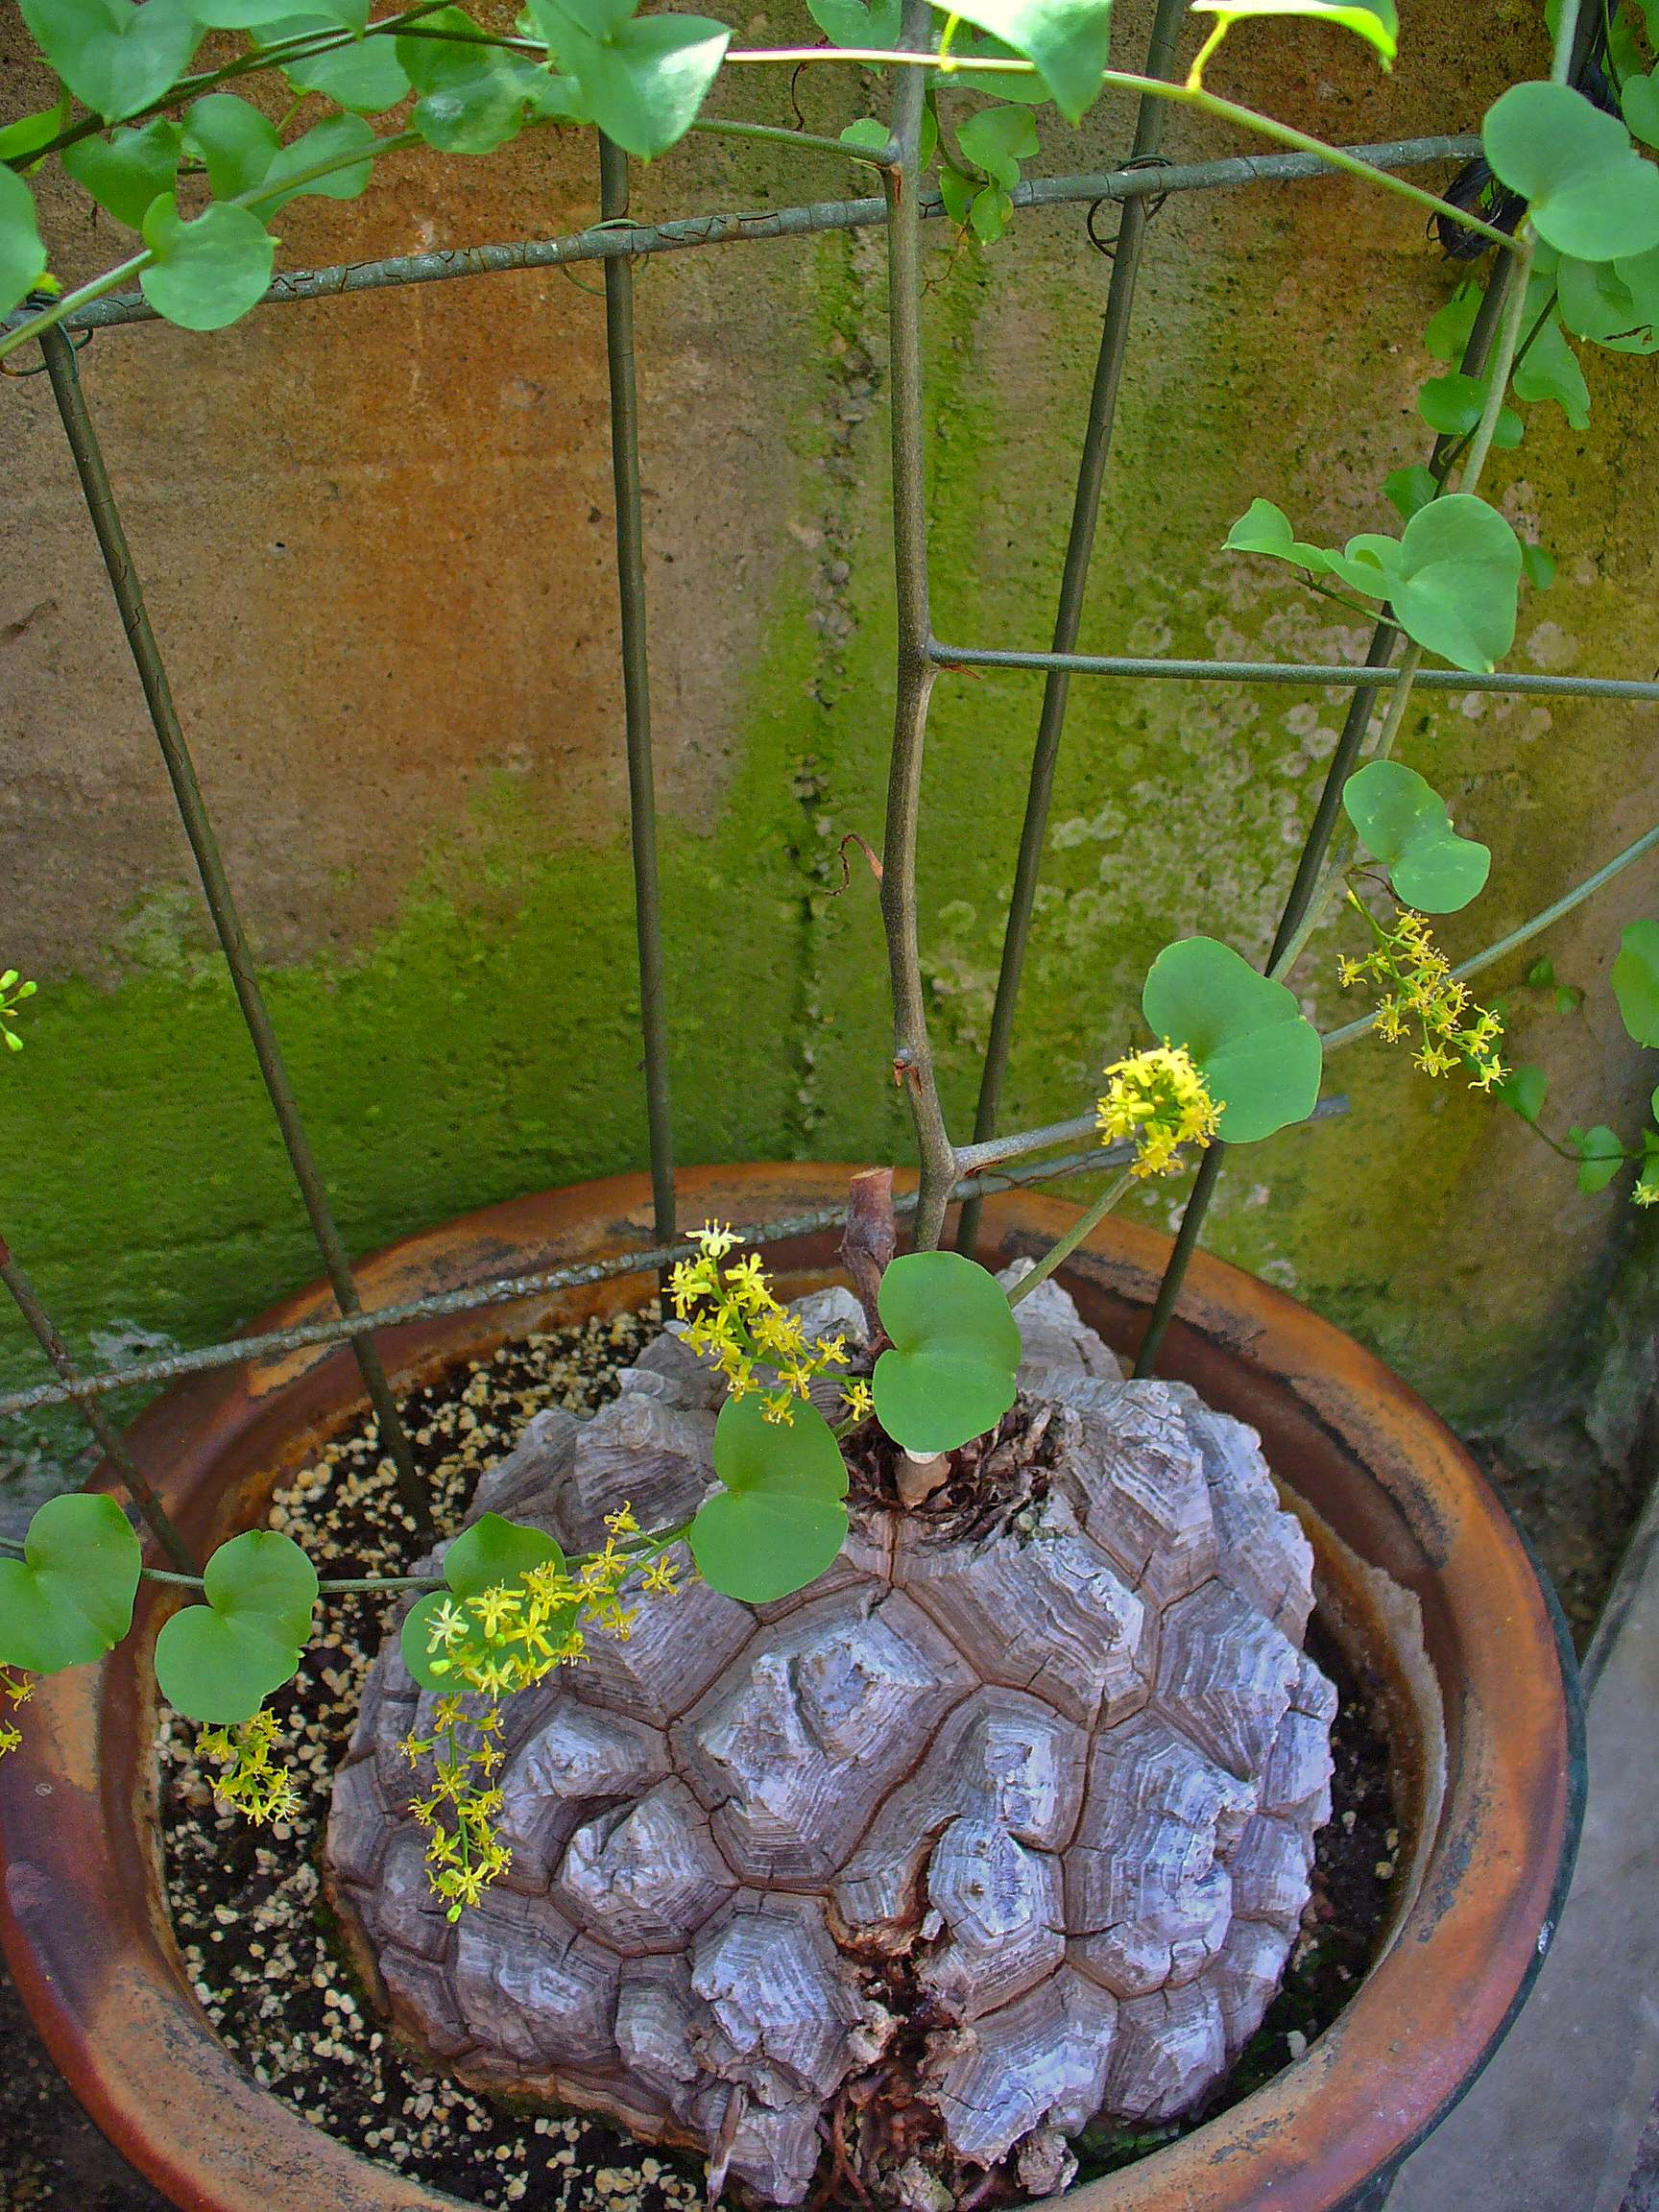 planta caparazon de tortuga roca viva